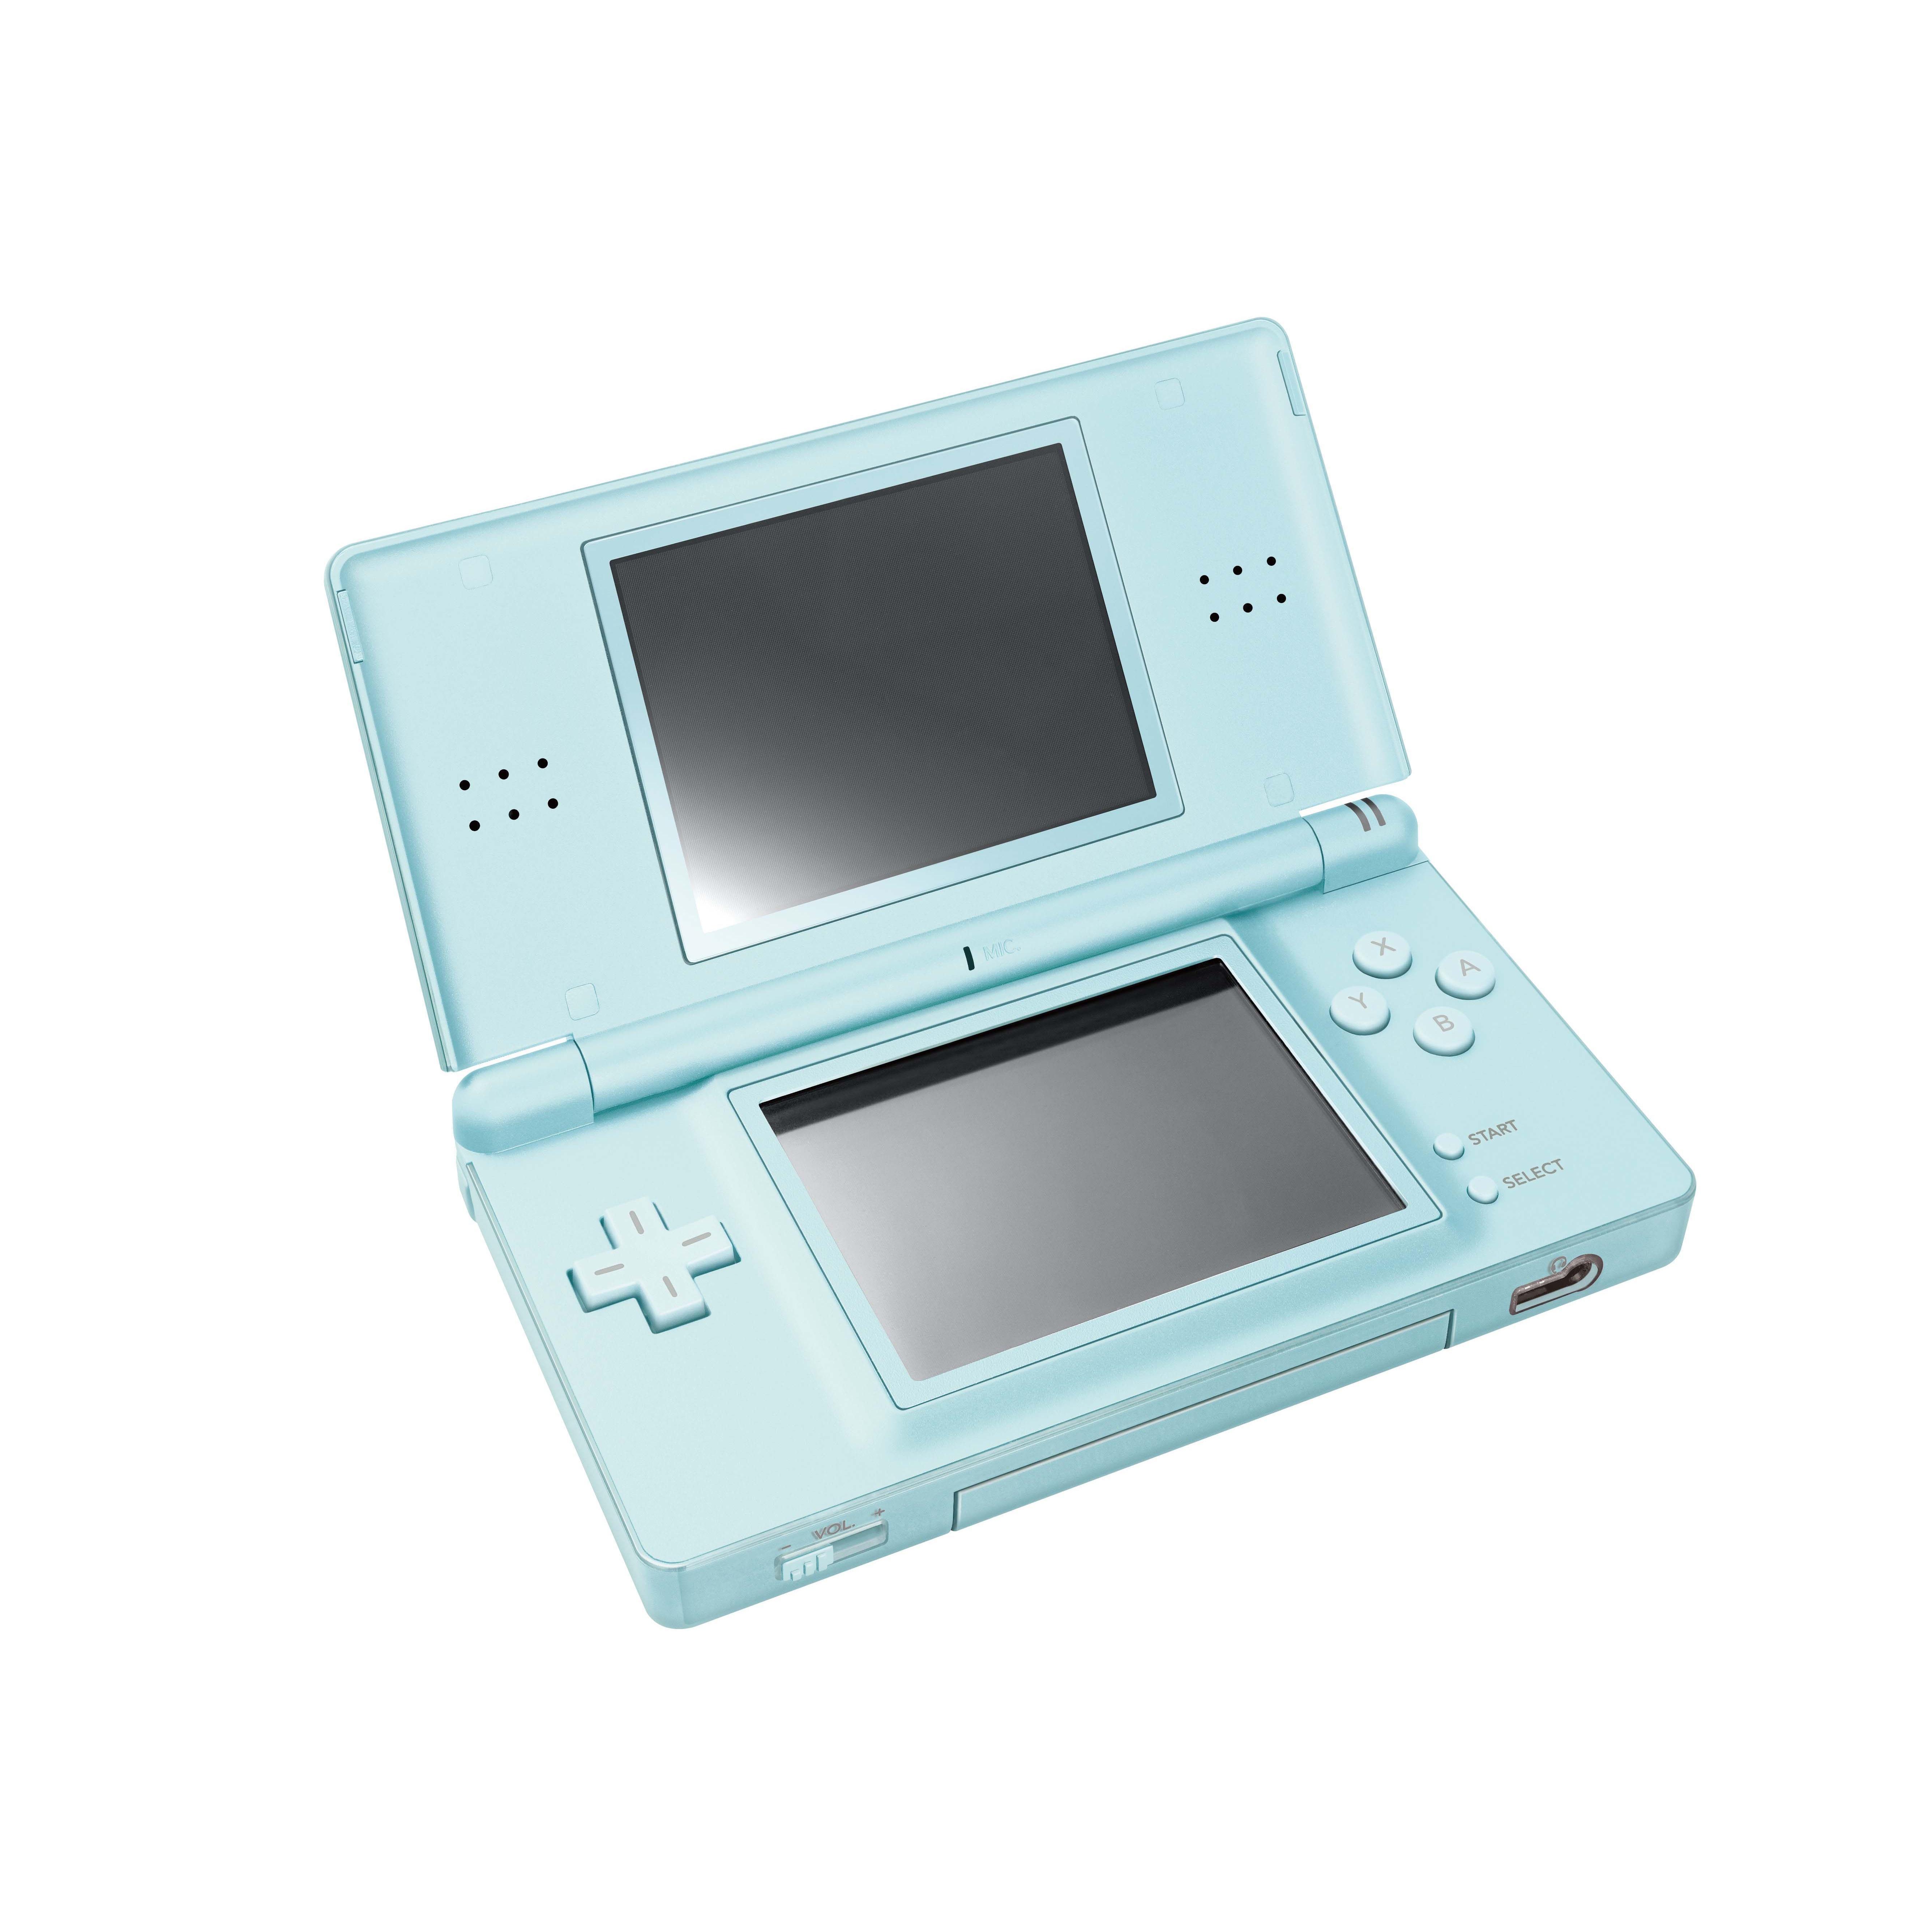 Nintendo DS Lite - HDD 0 MB - Blau